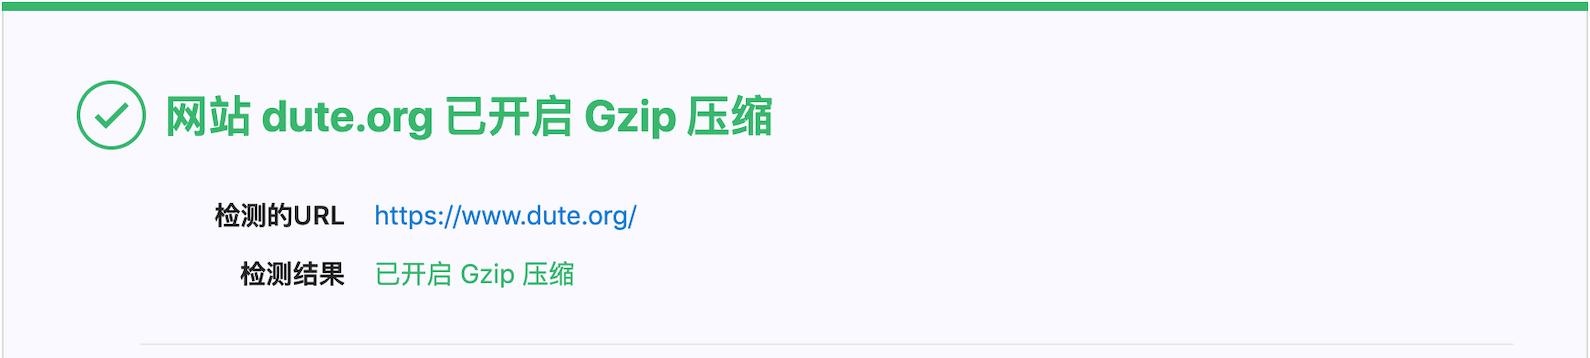 dute.org 已开启 GZip 压缩